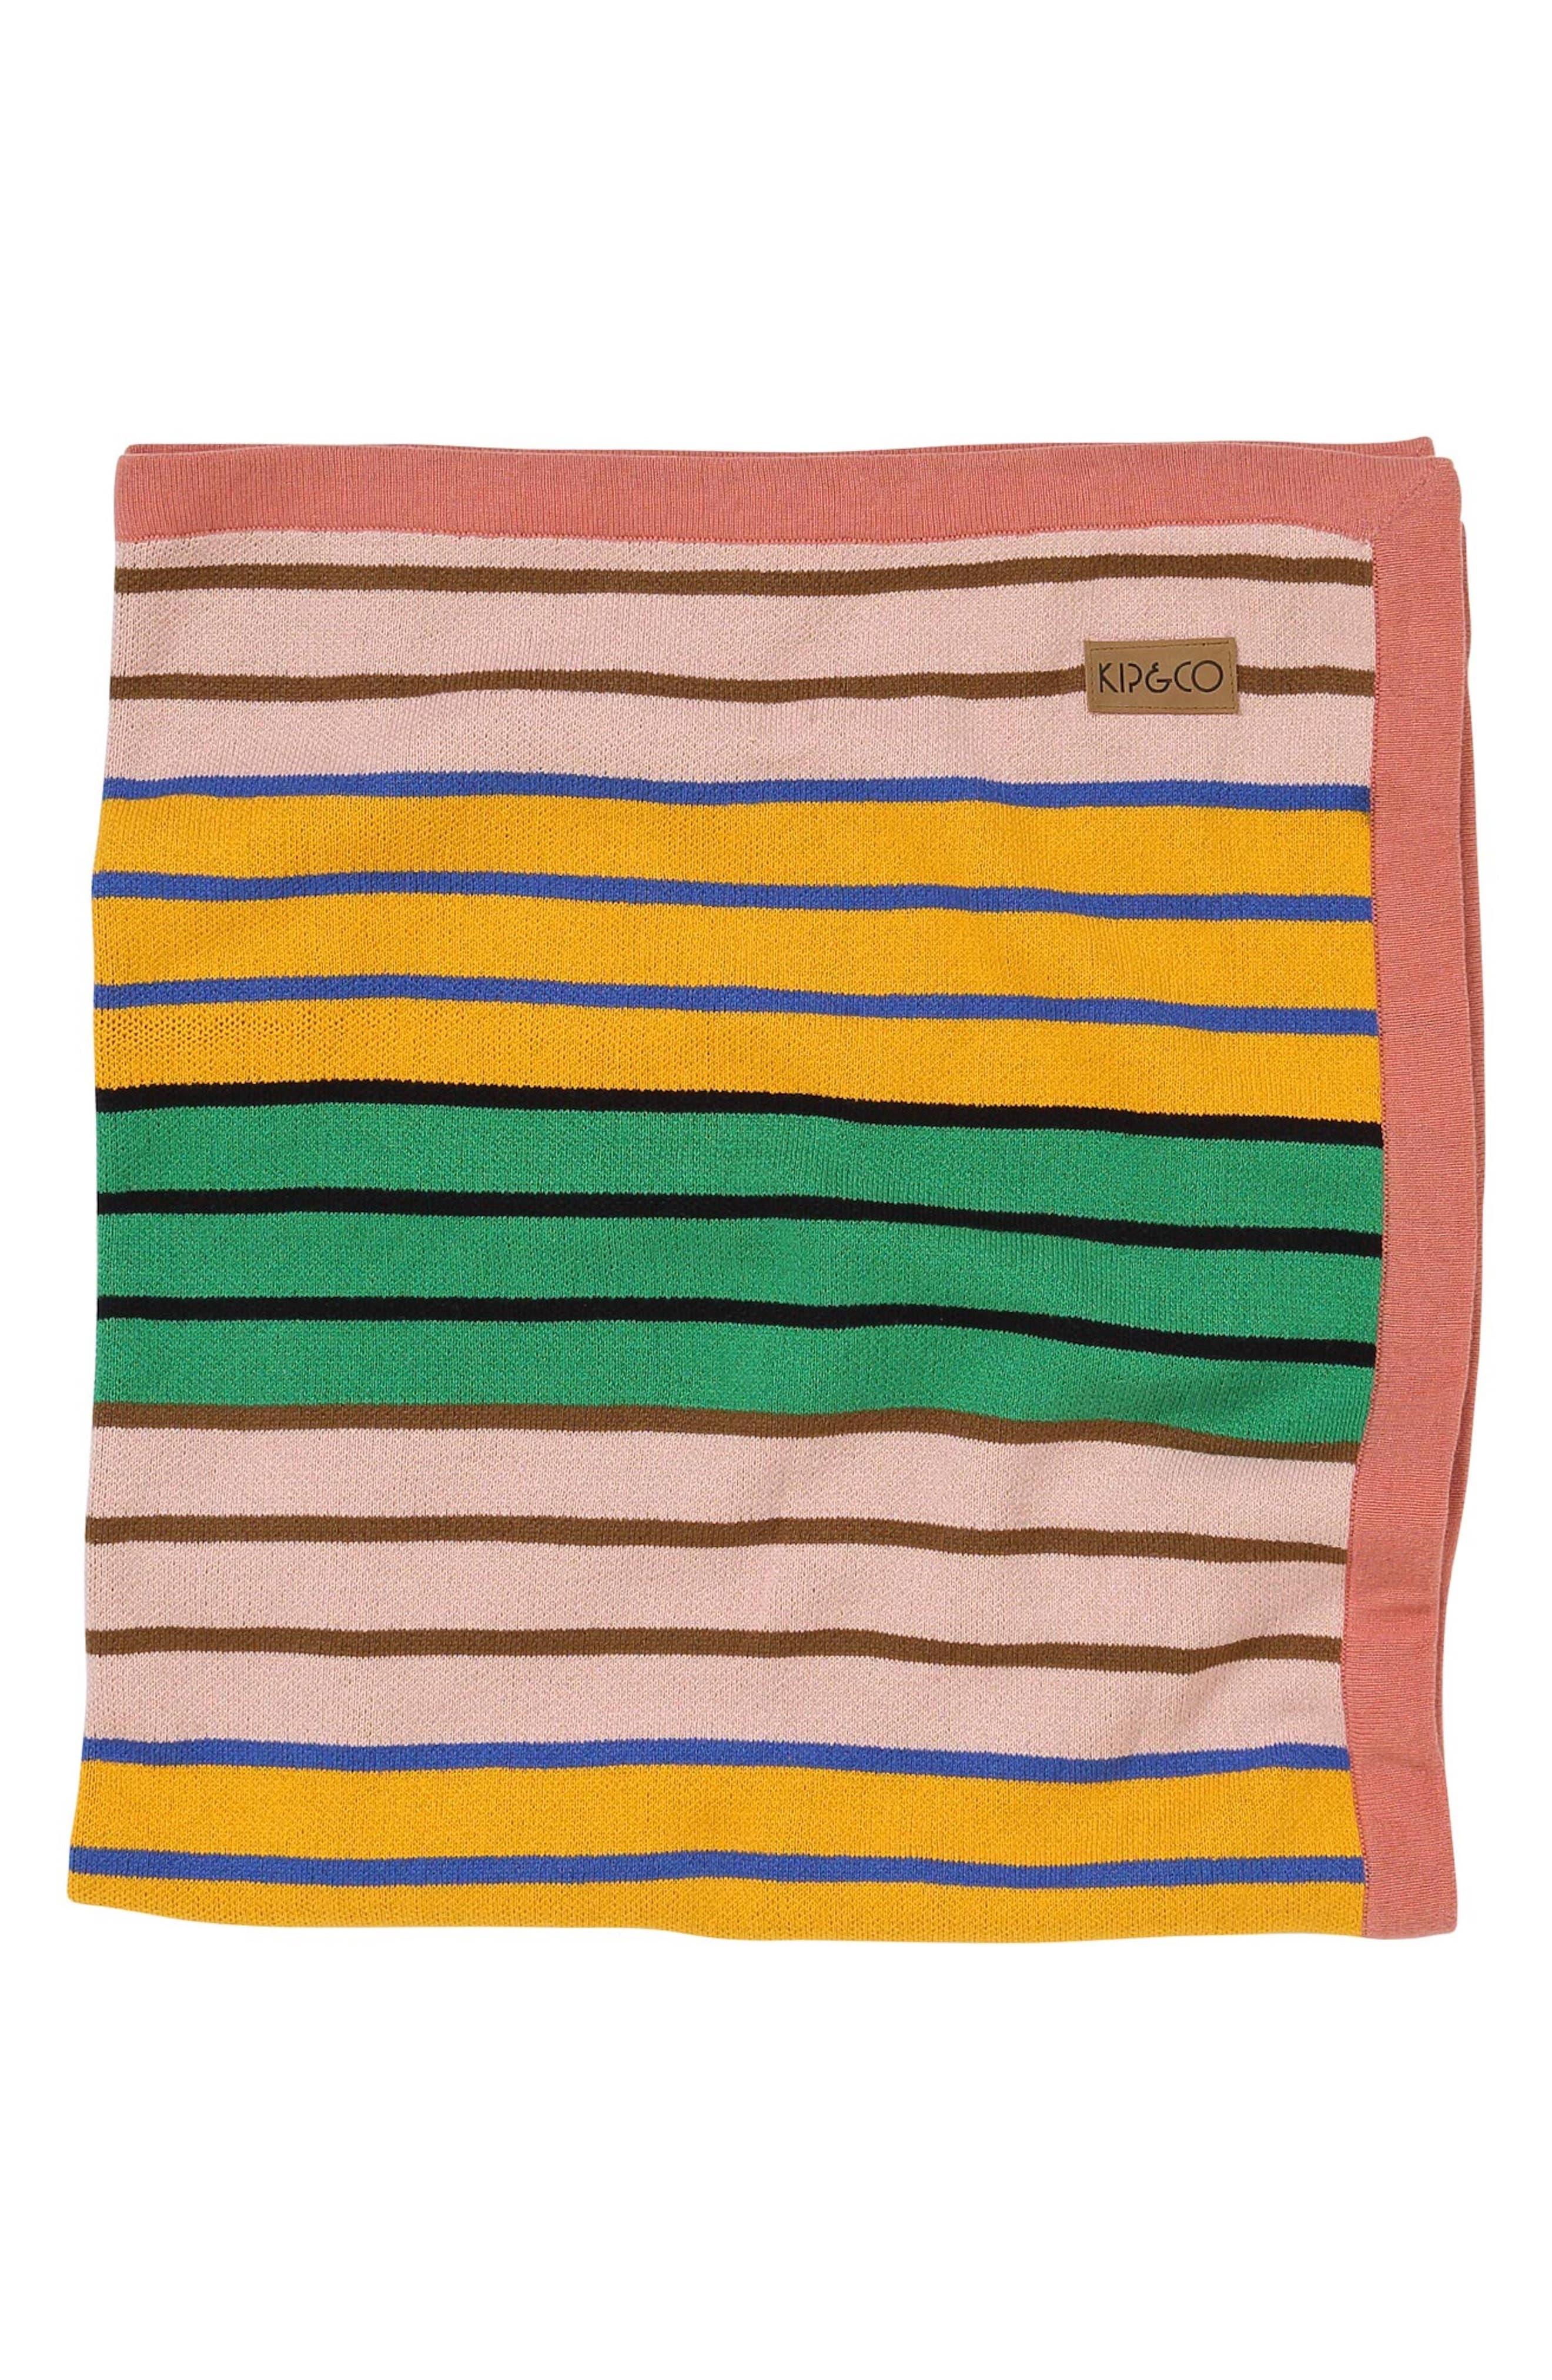 Stripe Knit Cotton Blanket,                             Main thumbnail 1, color,                             Multi